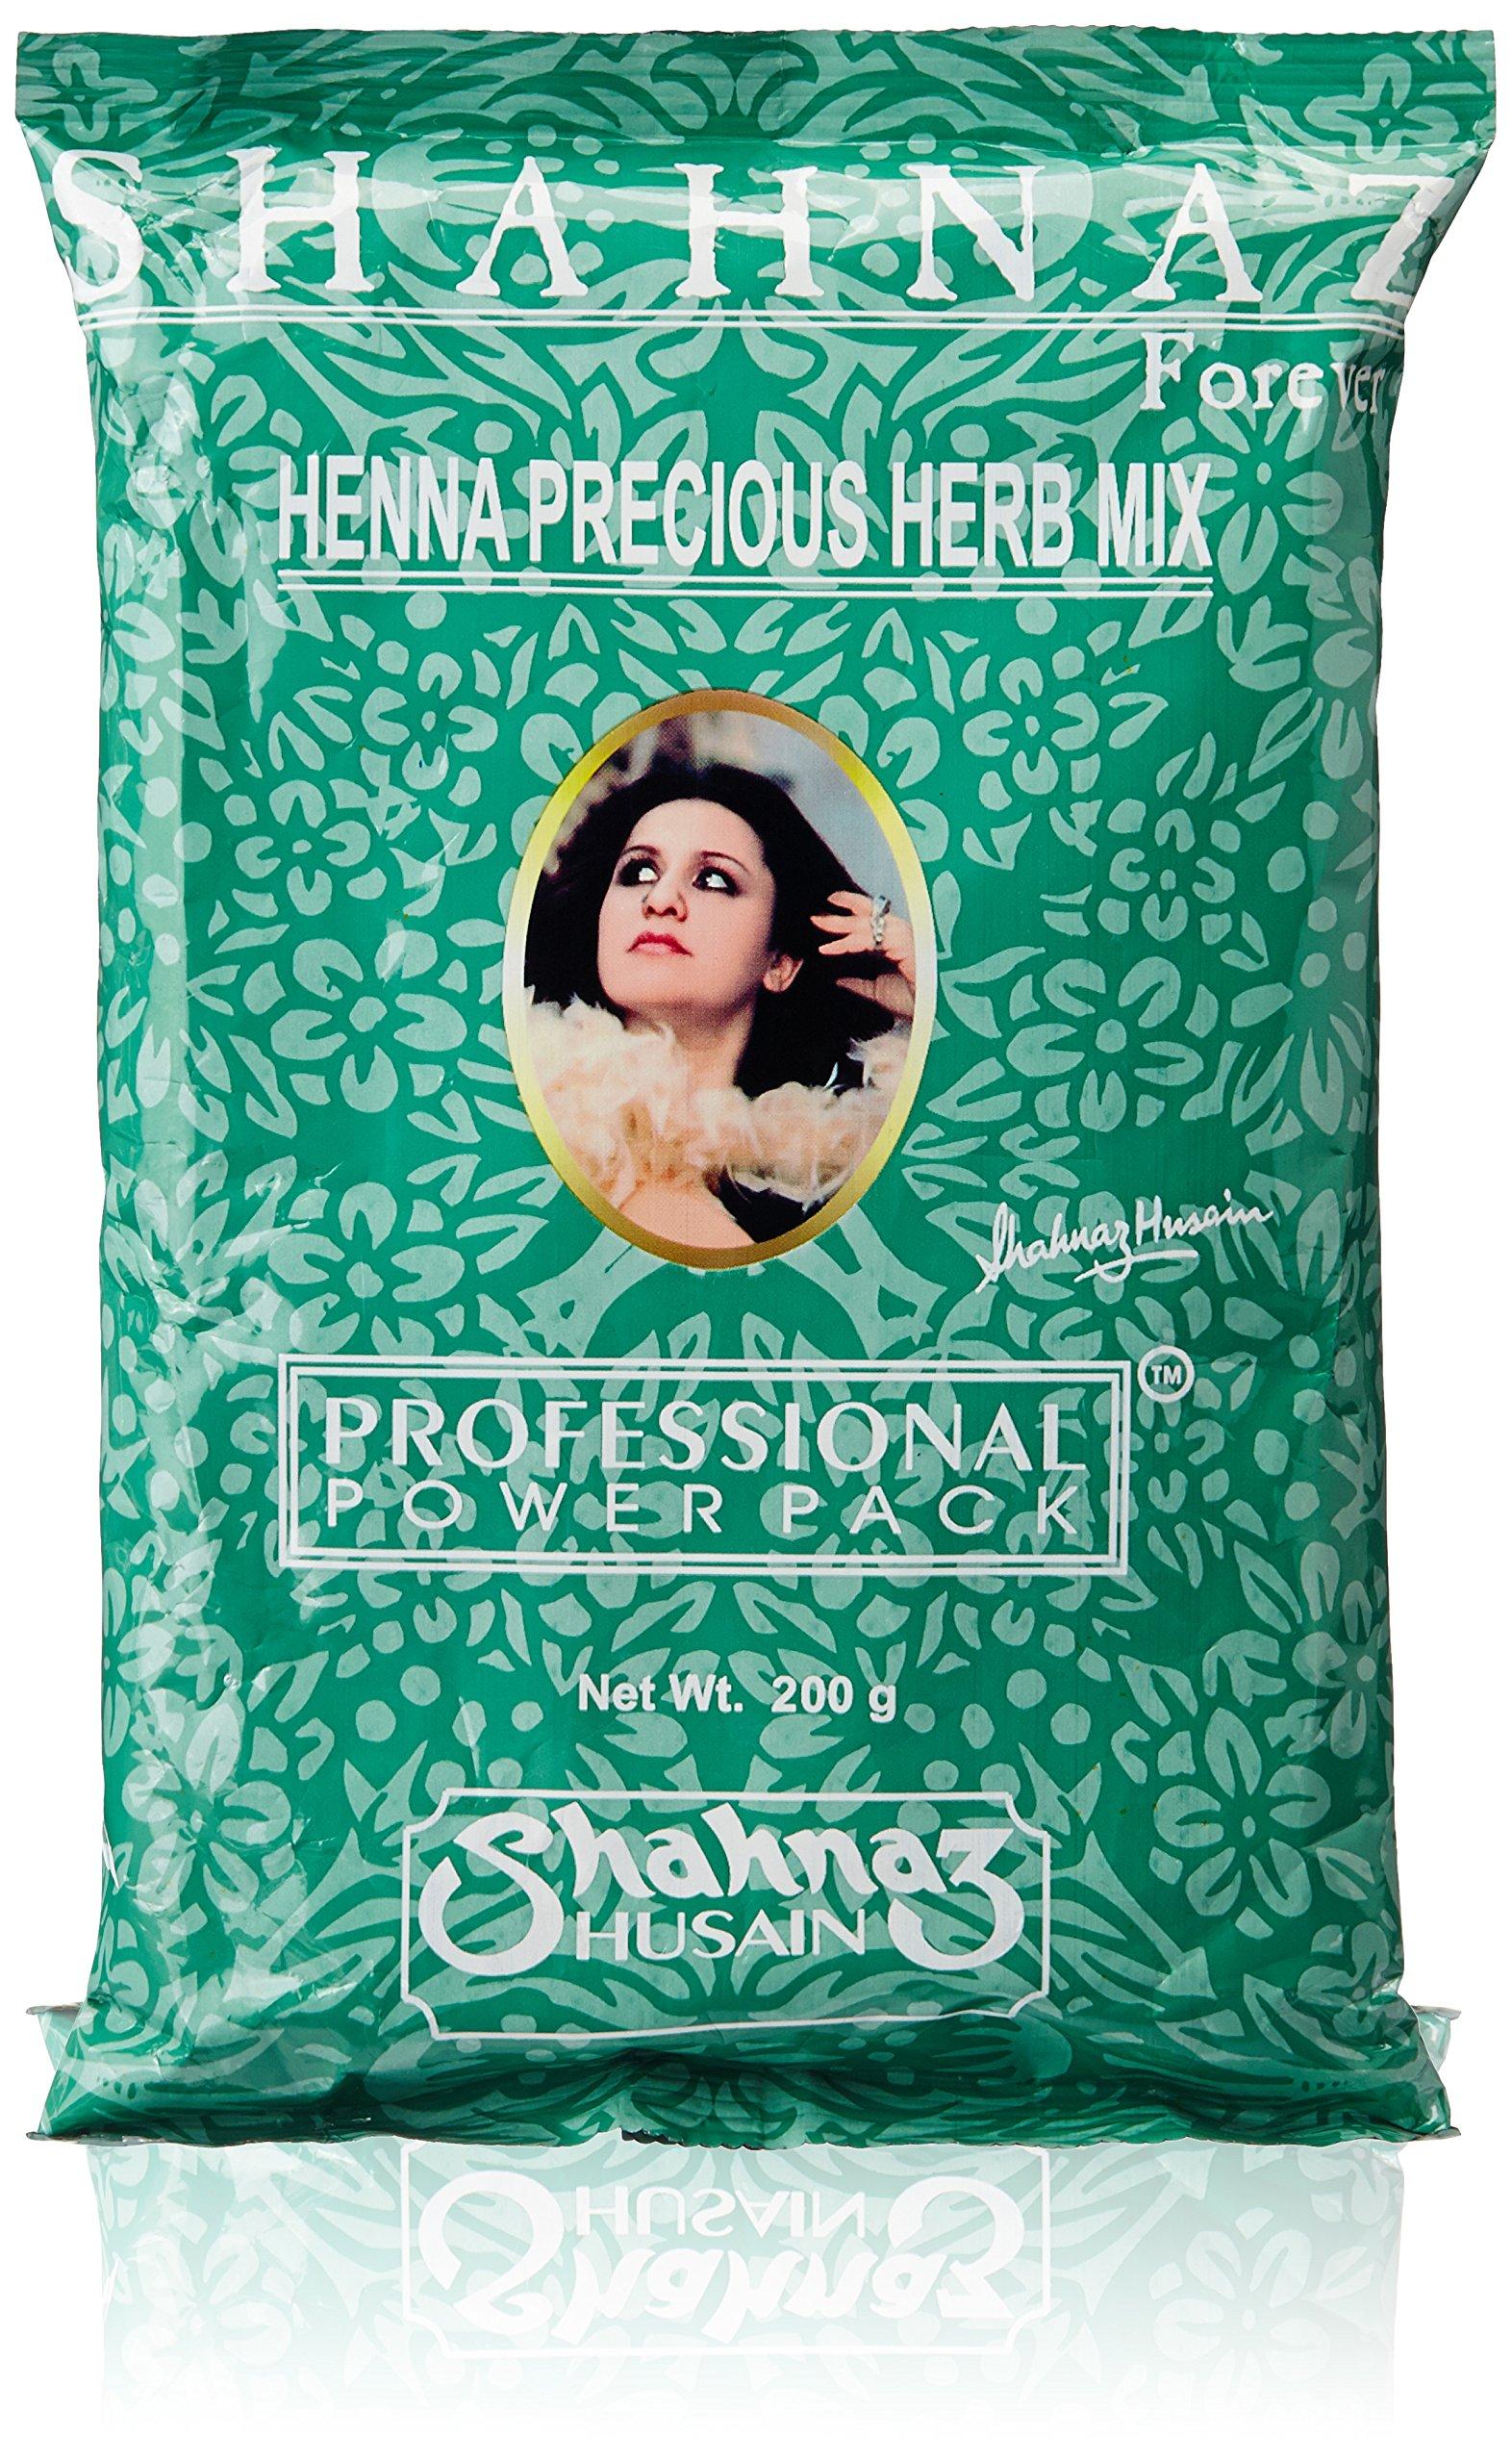 Shahnaz Husain Henna Precious Herb Mix, 200g (Buy 2 Get 1 Free) product image